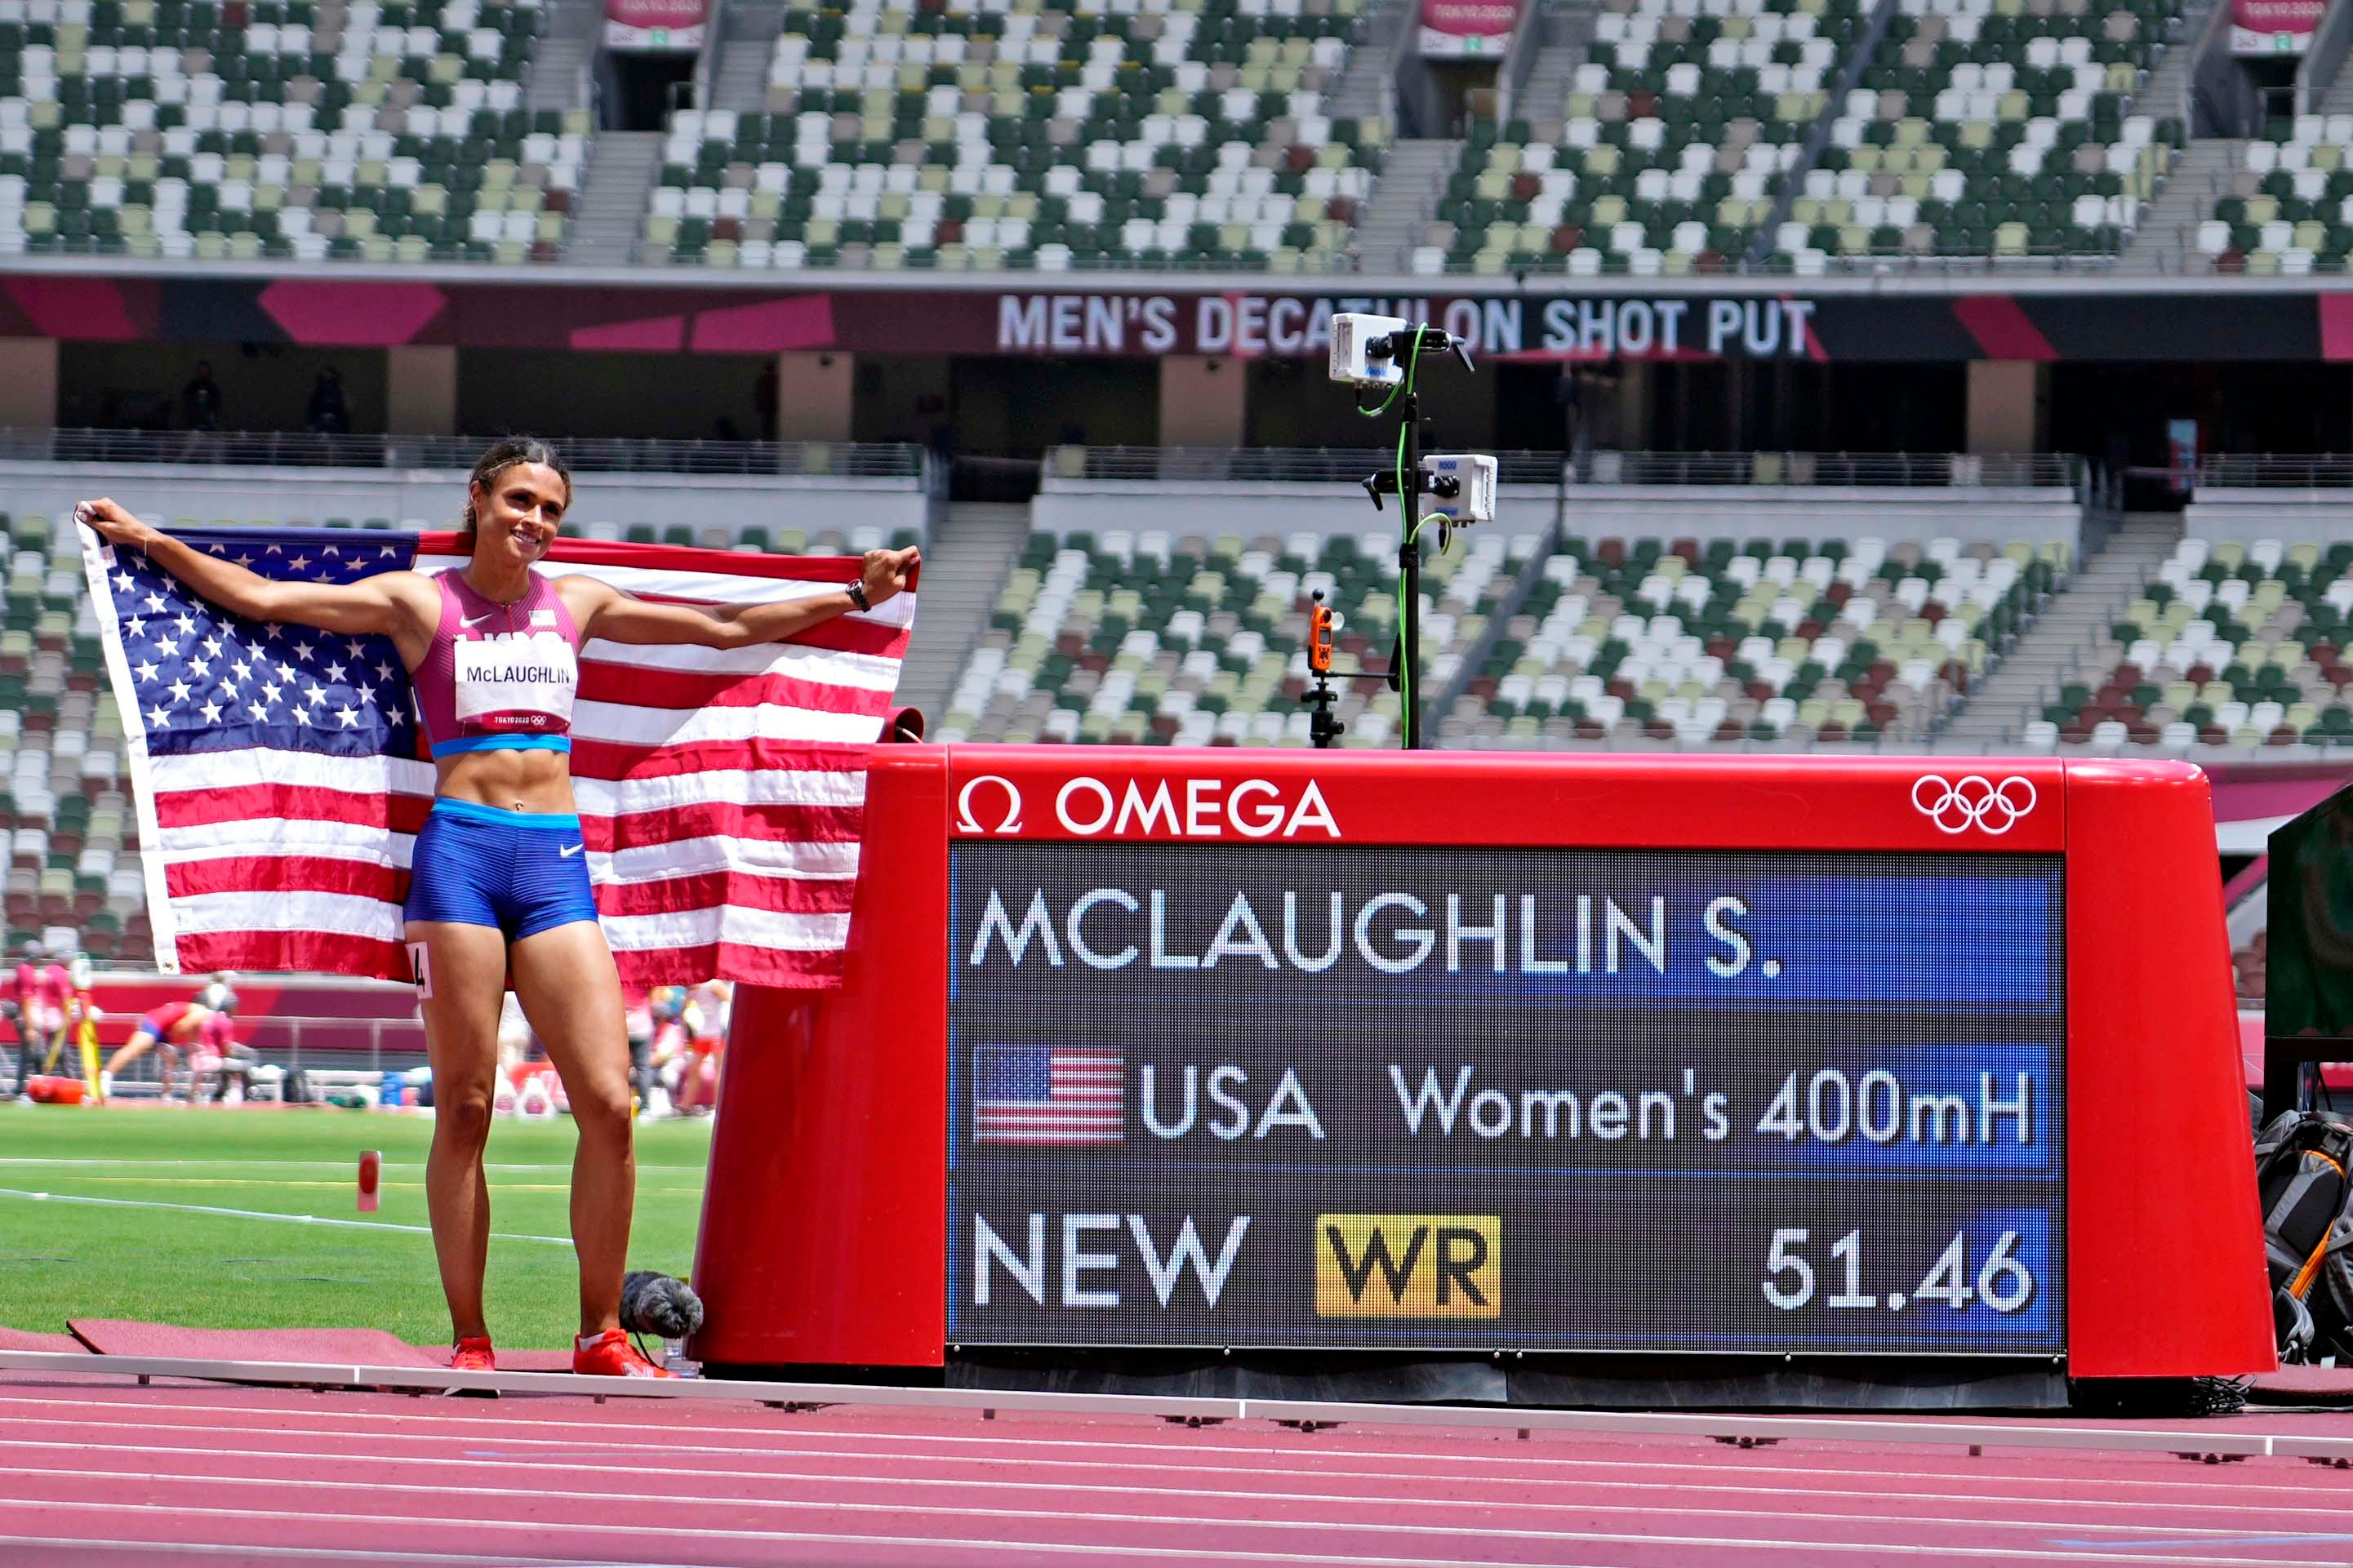 Sydney McLaughlin sets world record; Dalilah Muhammad wins silver in 400 hurdles